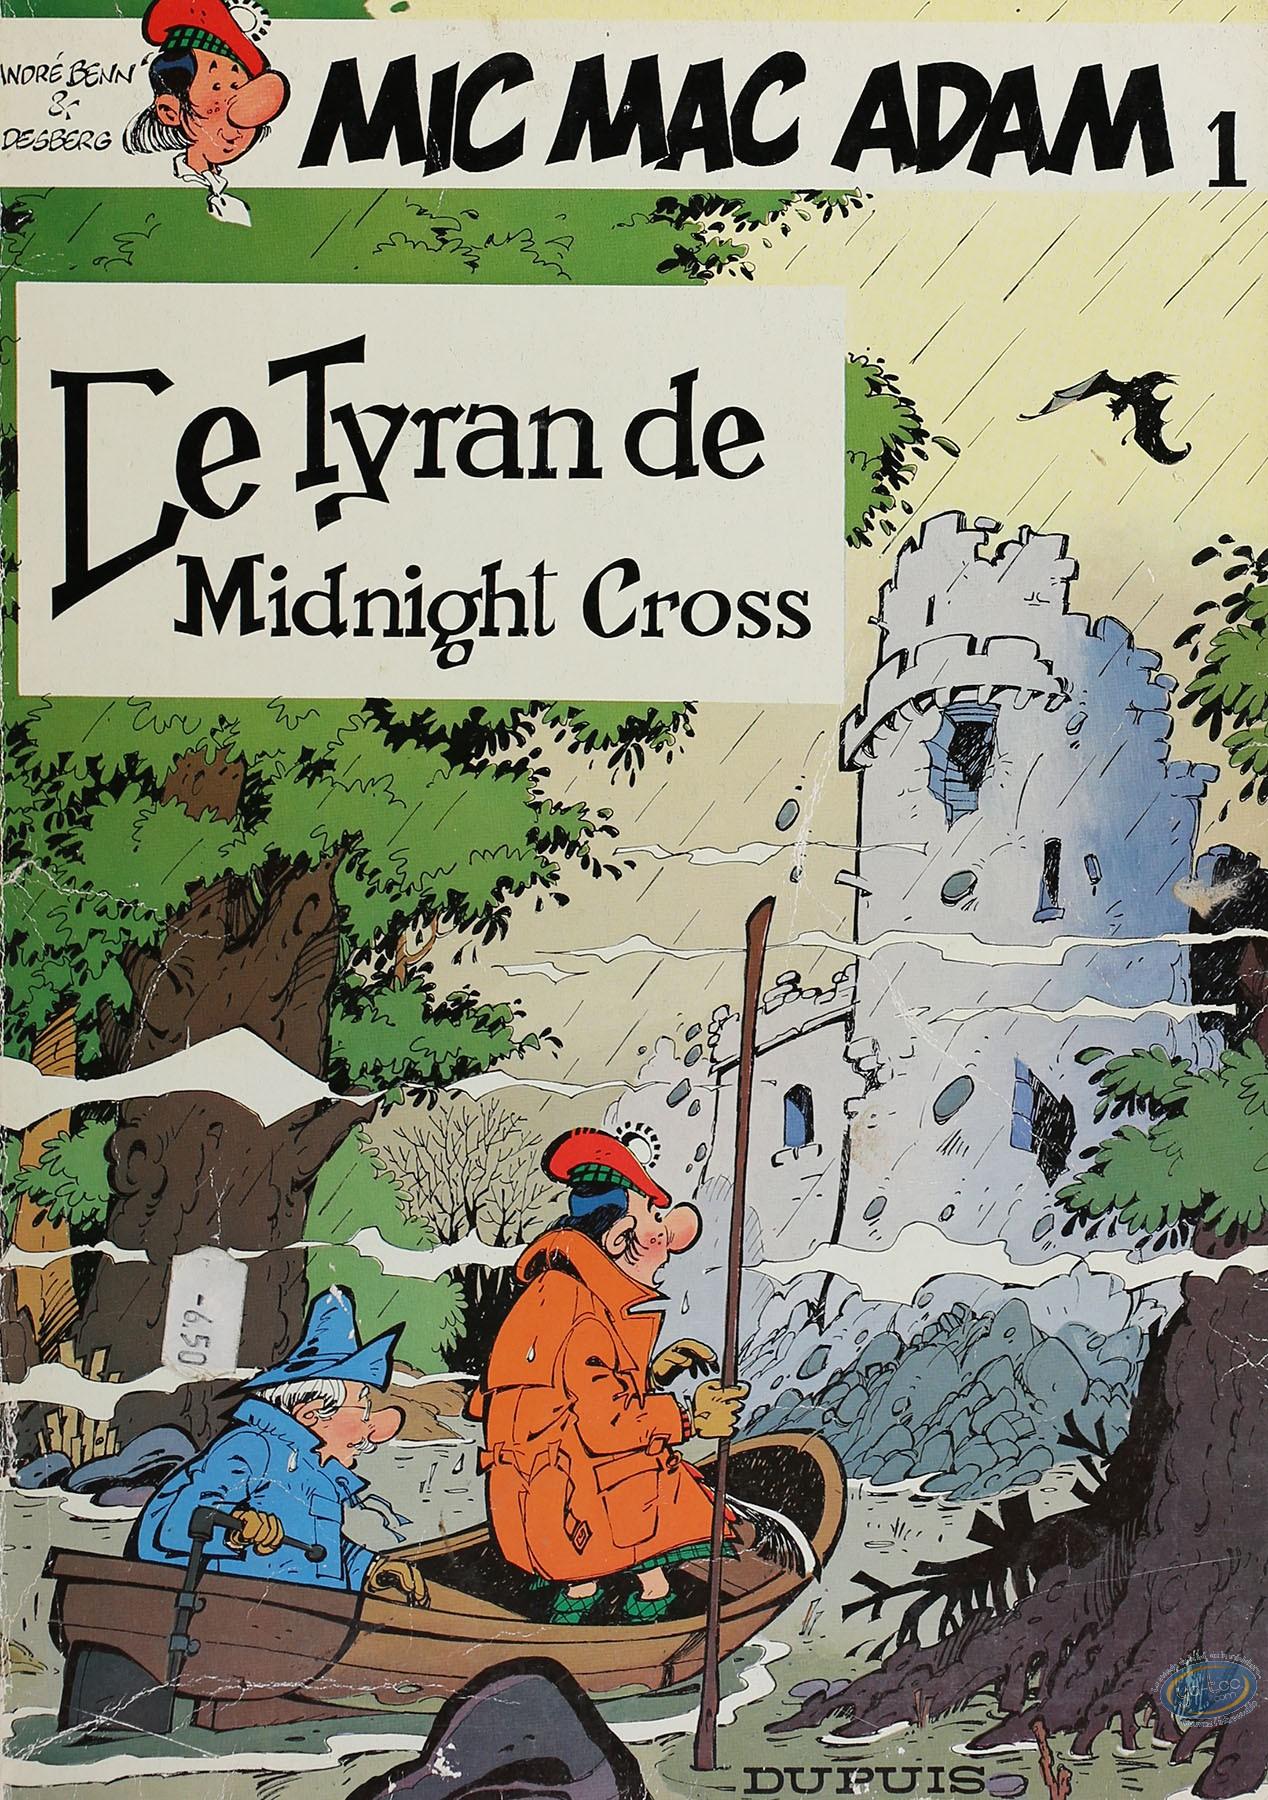 Listed European Comic Books, Mic Mac Adam : Le Tyran de Midnight Cross